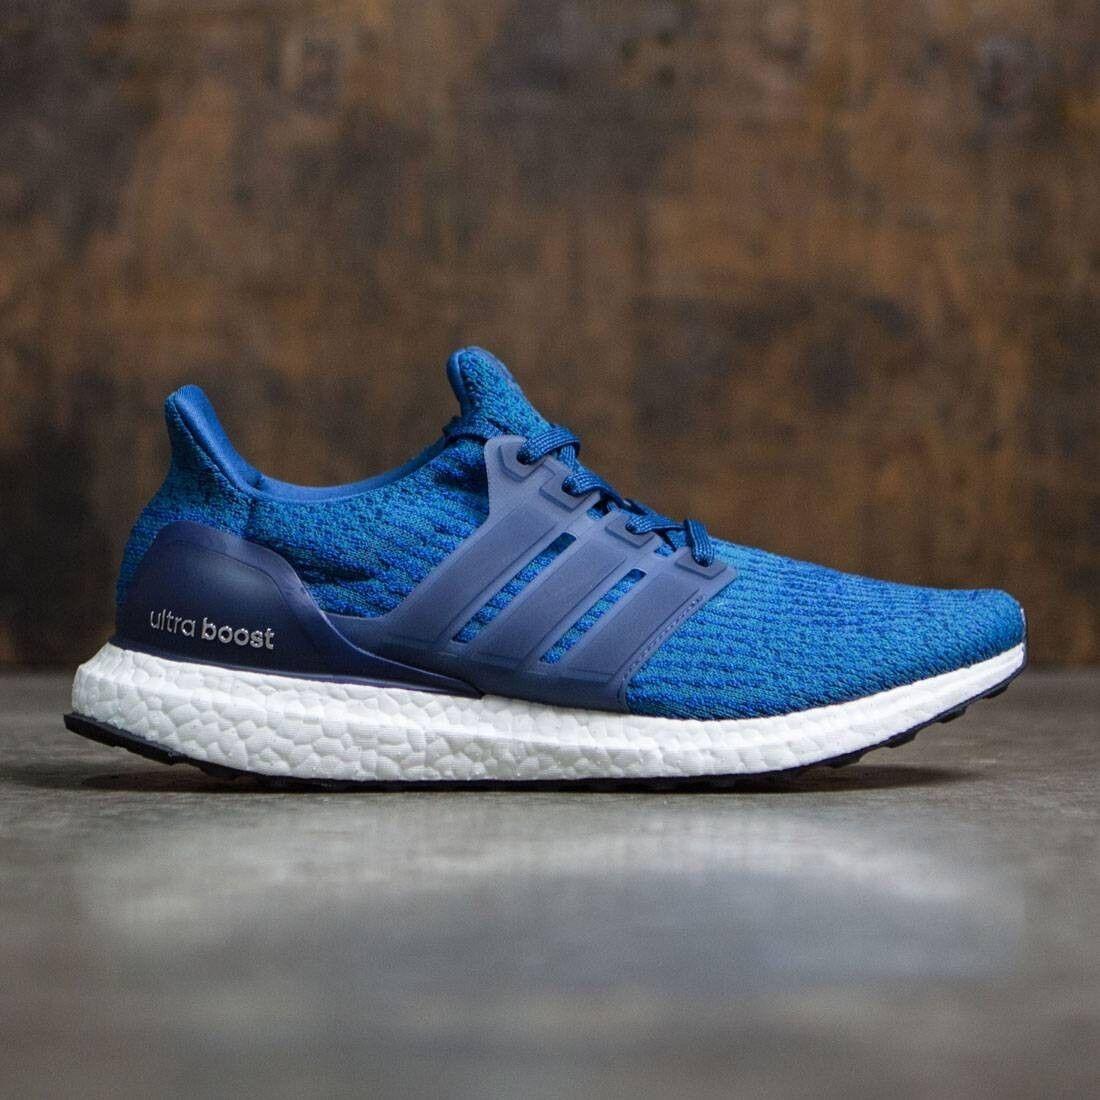 2018 Adidas Ultra Boost 3.0 Mystery Blue Size 14. BA8844 pk yeezy nmd